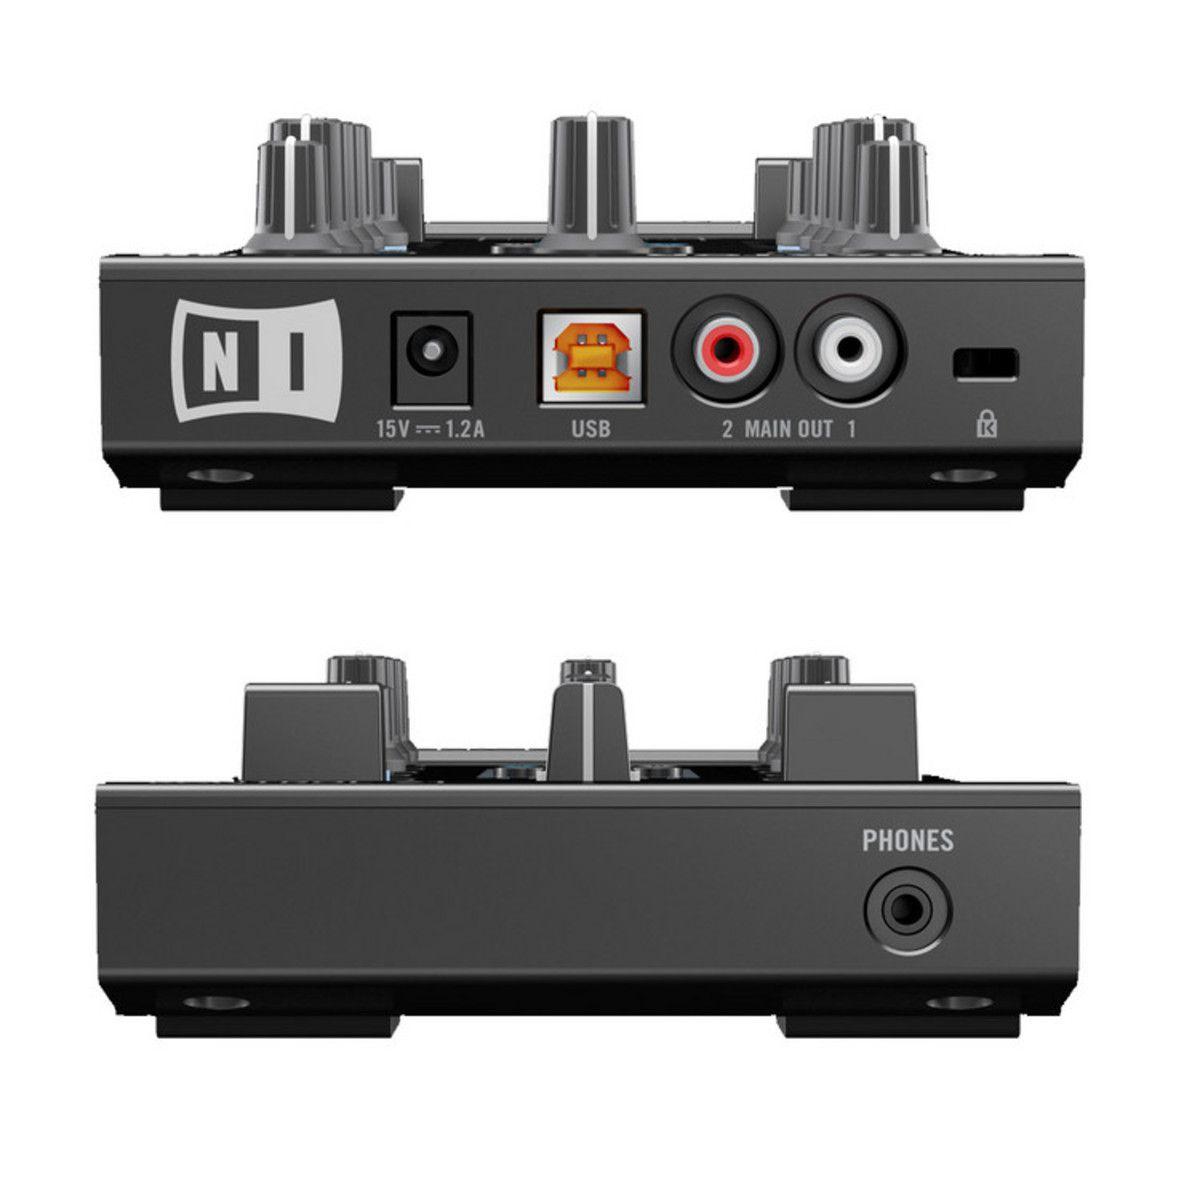 Controladora Native Instruments Traktor Kontrol Z1 com case UDG